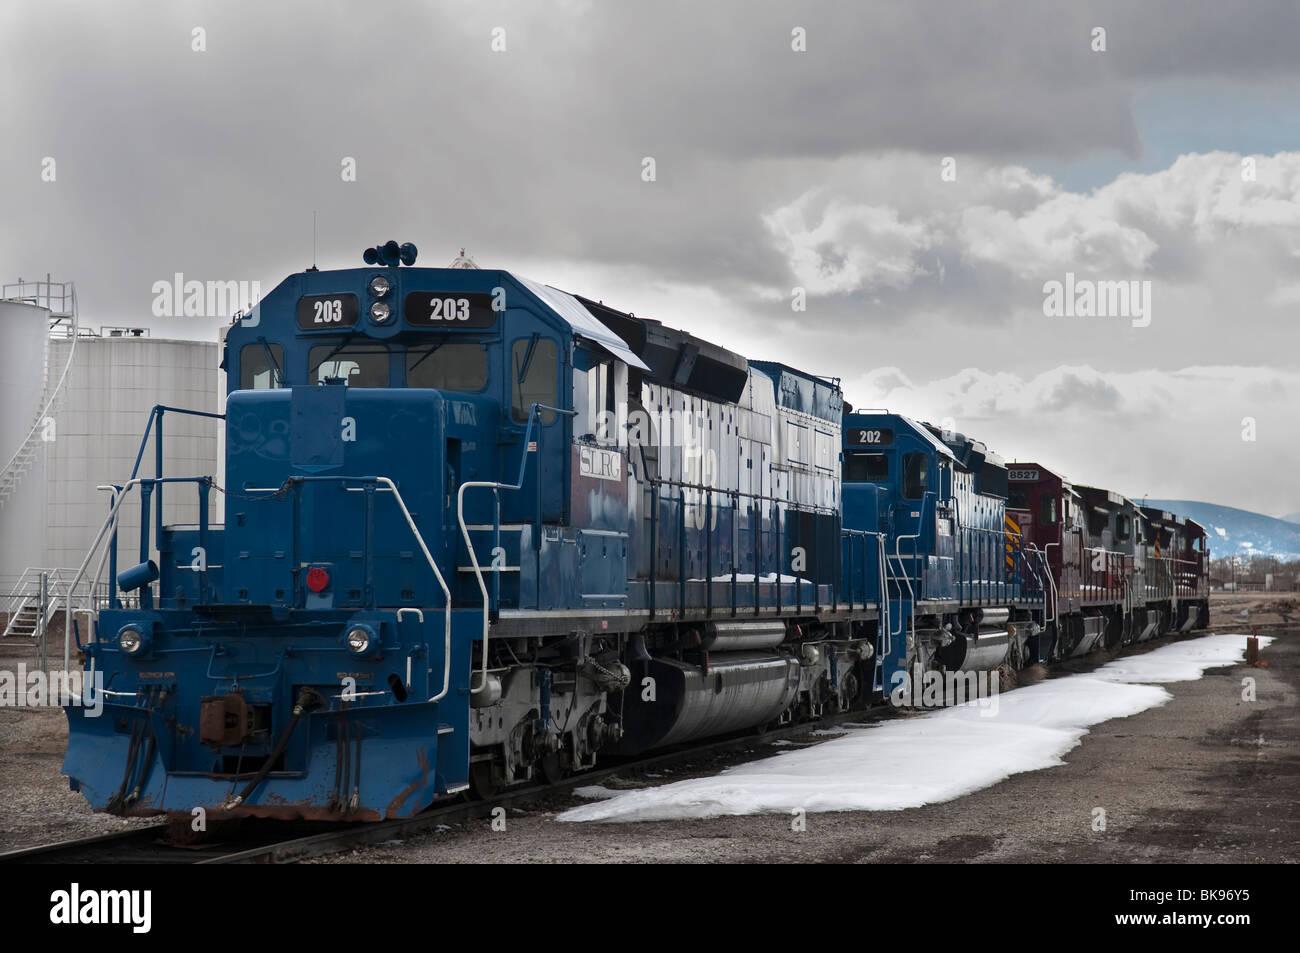 Old San Luis & Rio Grande railroad diesel locomotive - Stock Image